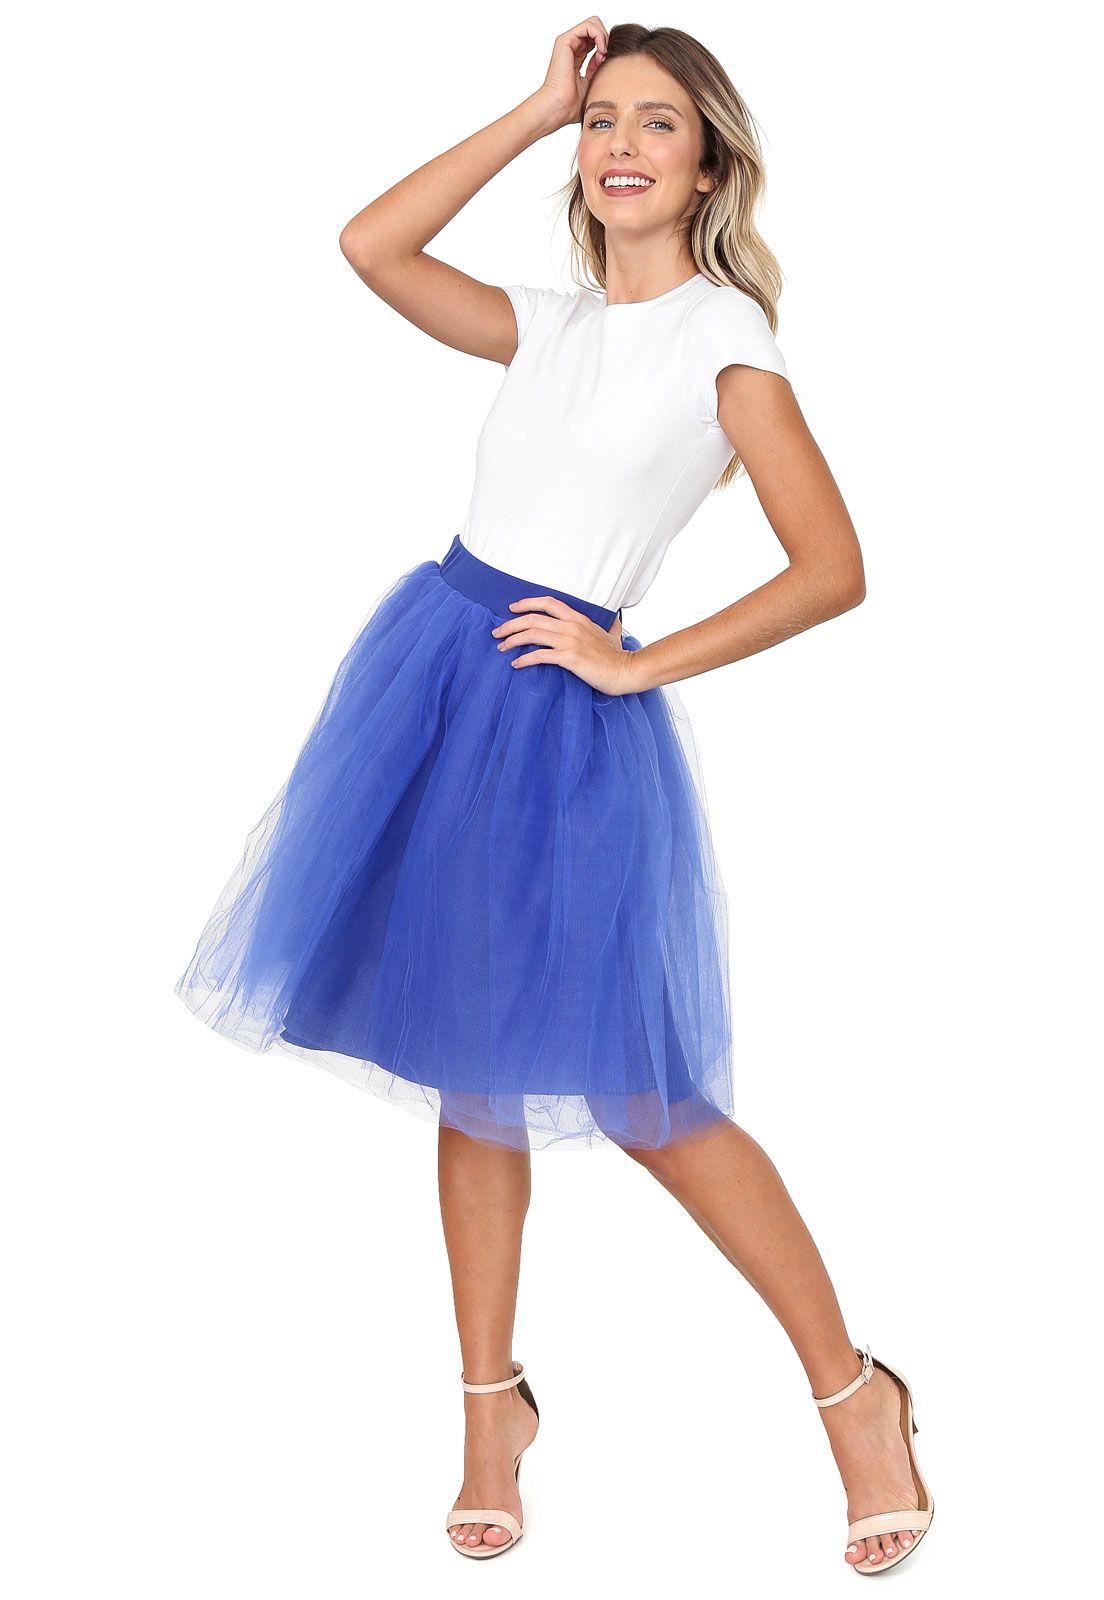 Saia de Tule Midi Amo Tule Fantasia Bailarina Moda Clássica